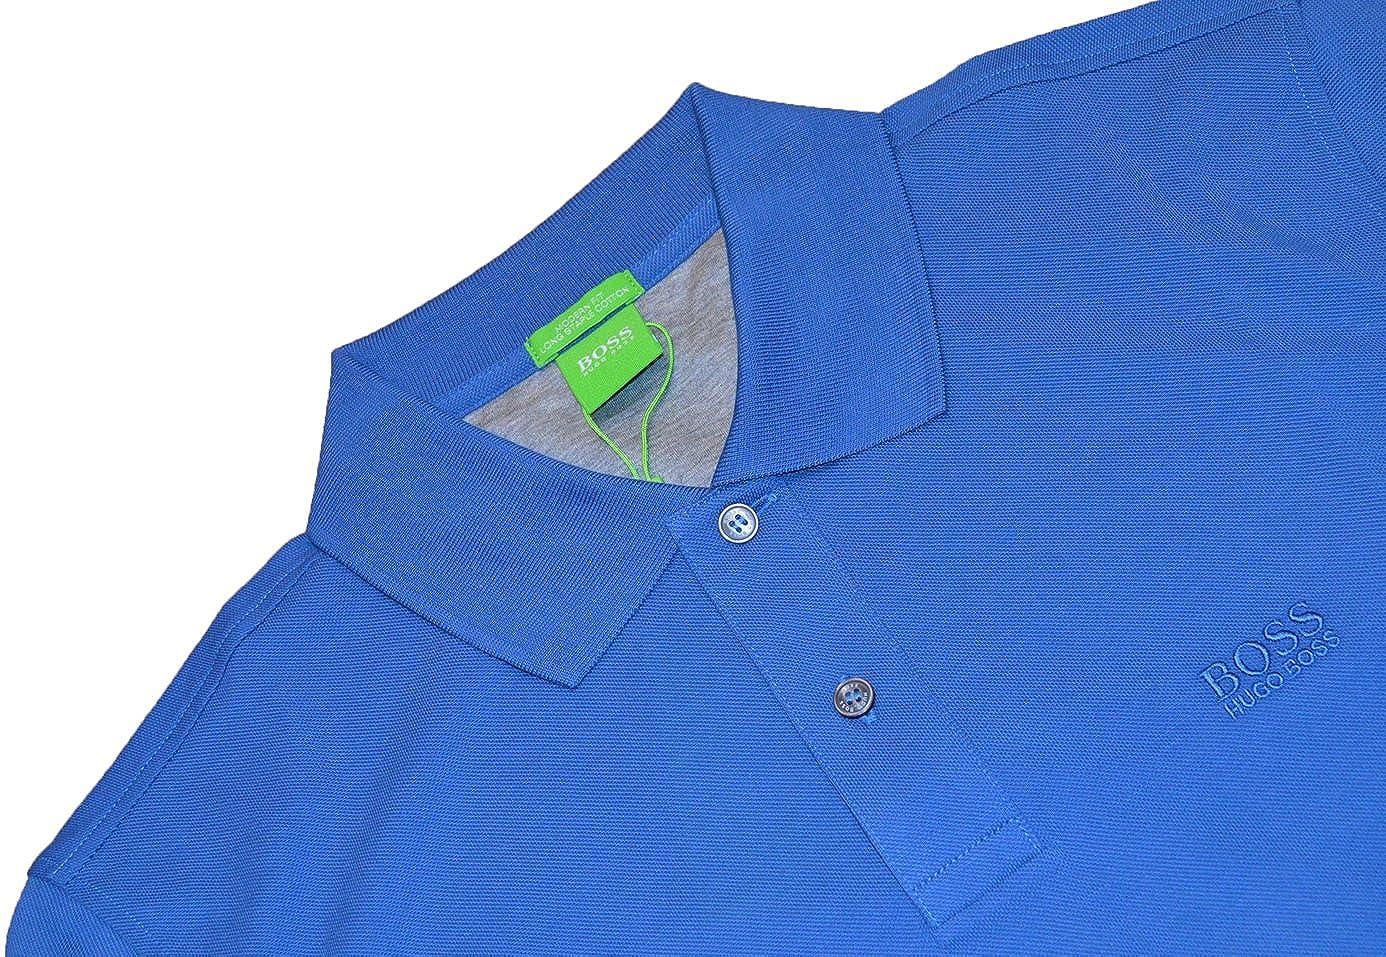 Amazon.com: Hugo Boss Logotipo Verde c-firenze algodón de ...